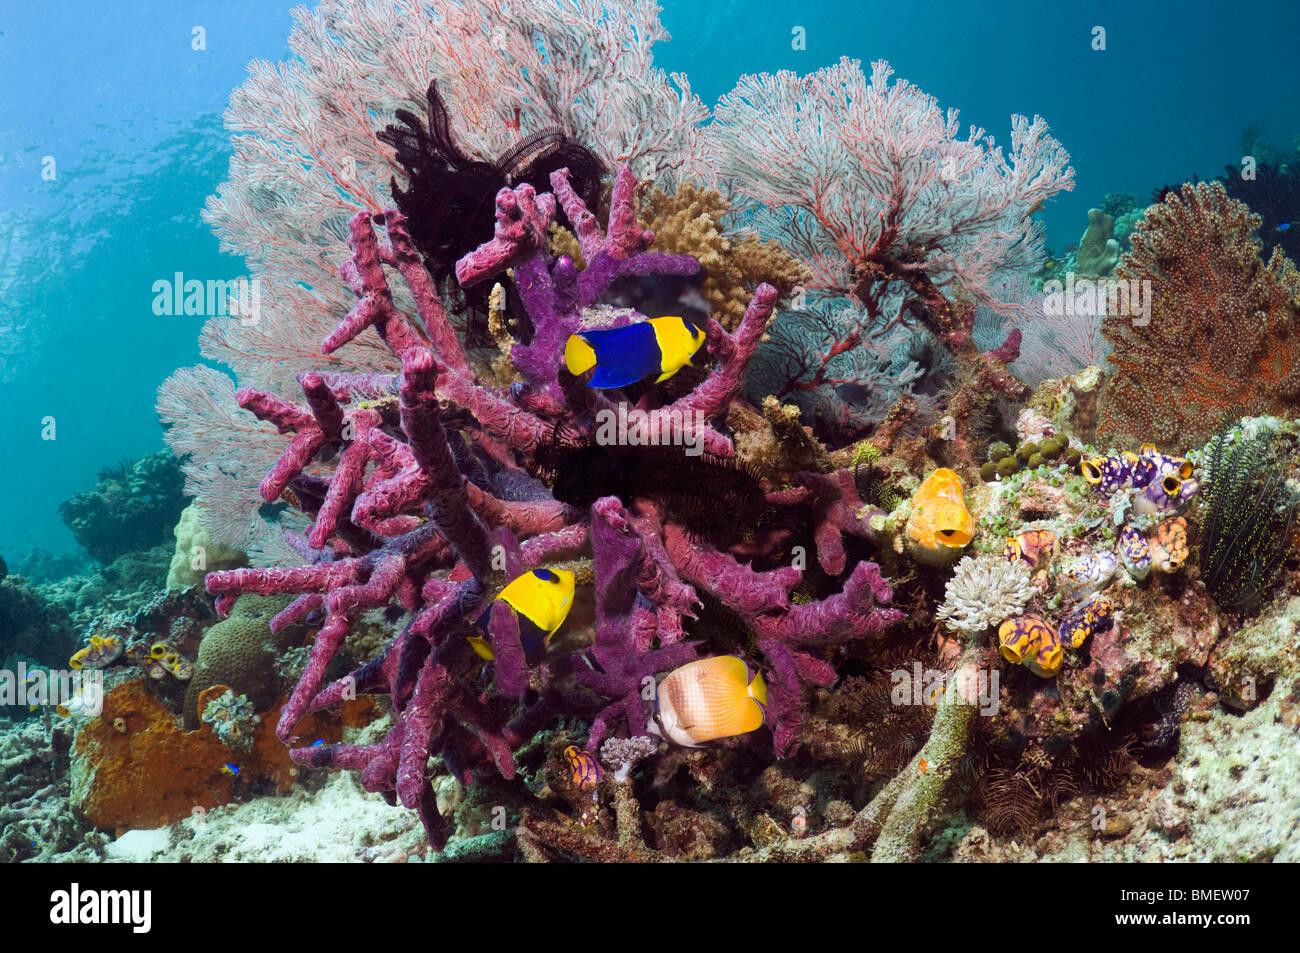 Bicolor angelfish, Klein's butterflyfish with gorgonian and purple encrusting sponge, Misool, West Papua, Indonesia Stock Photo